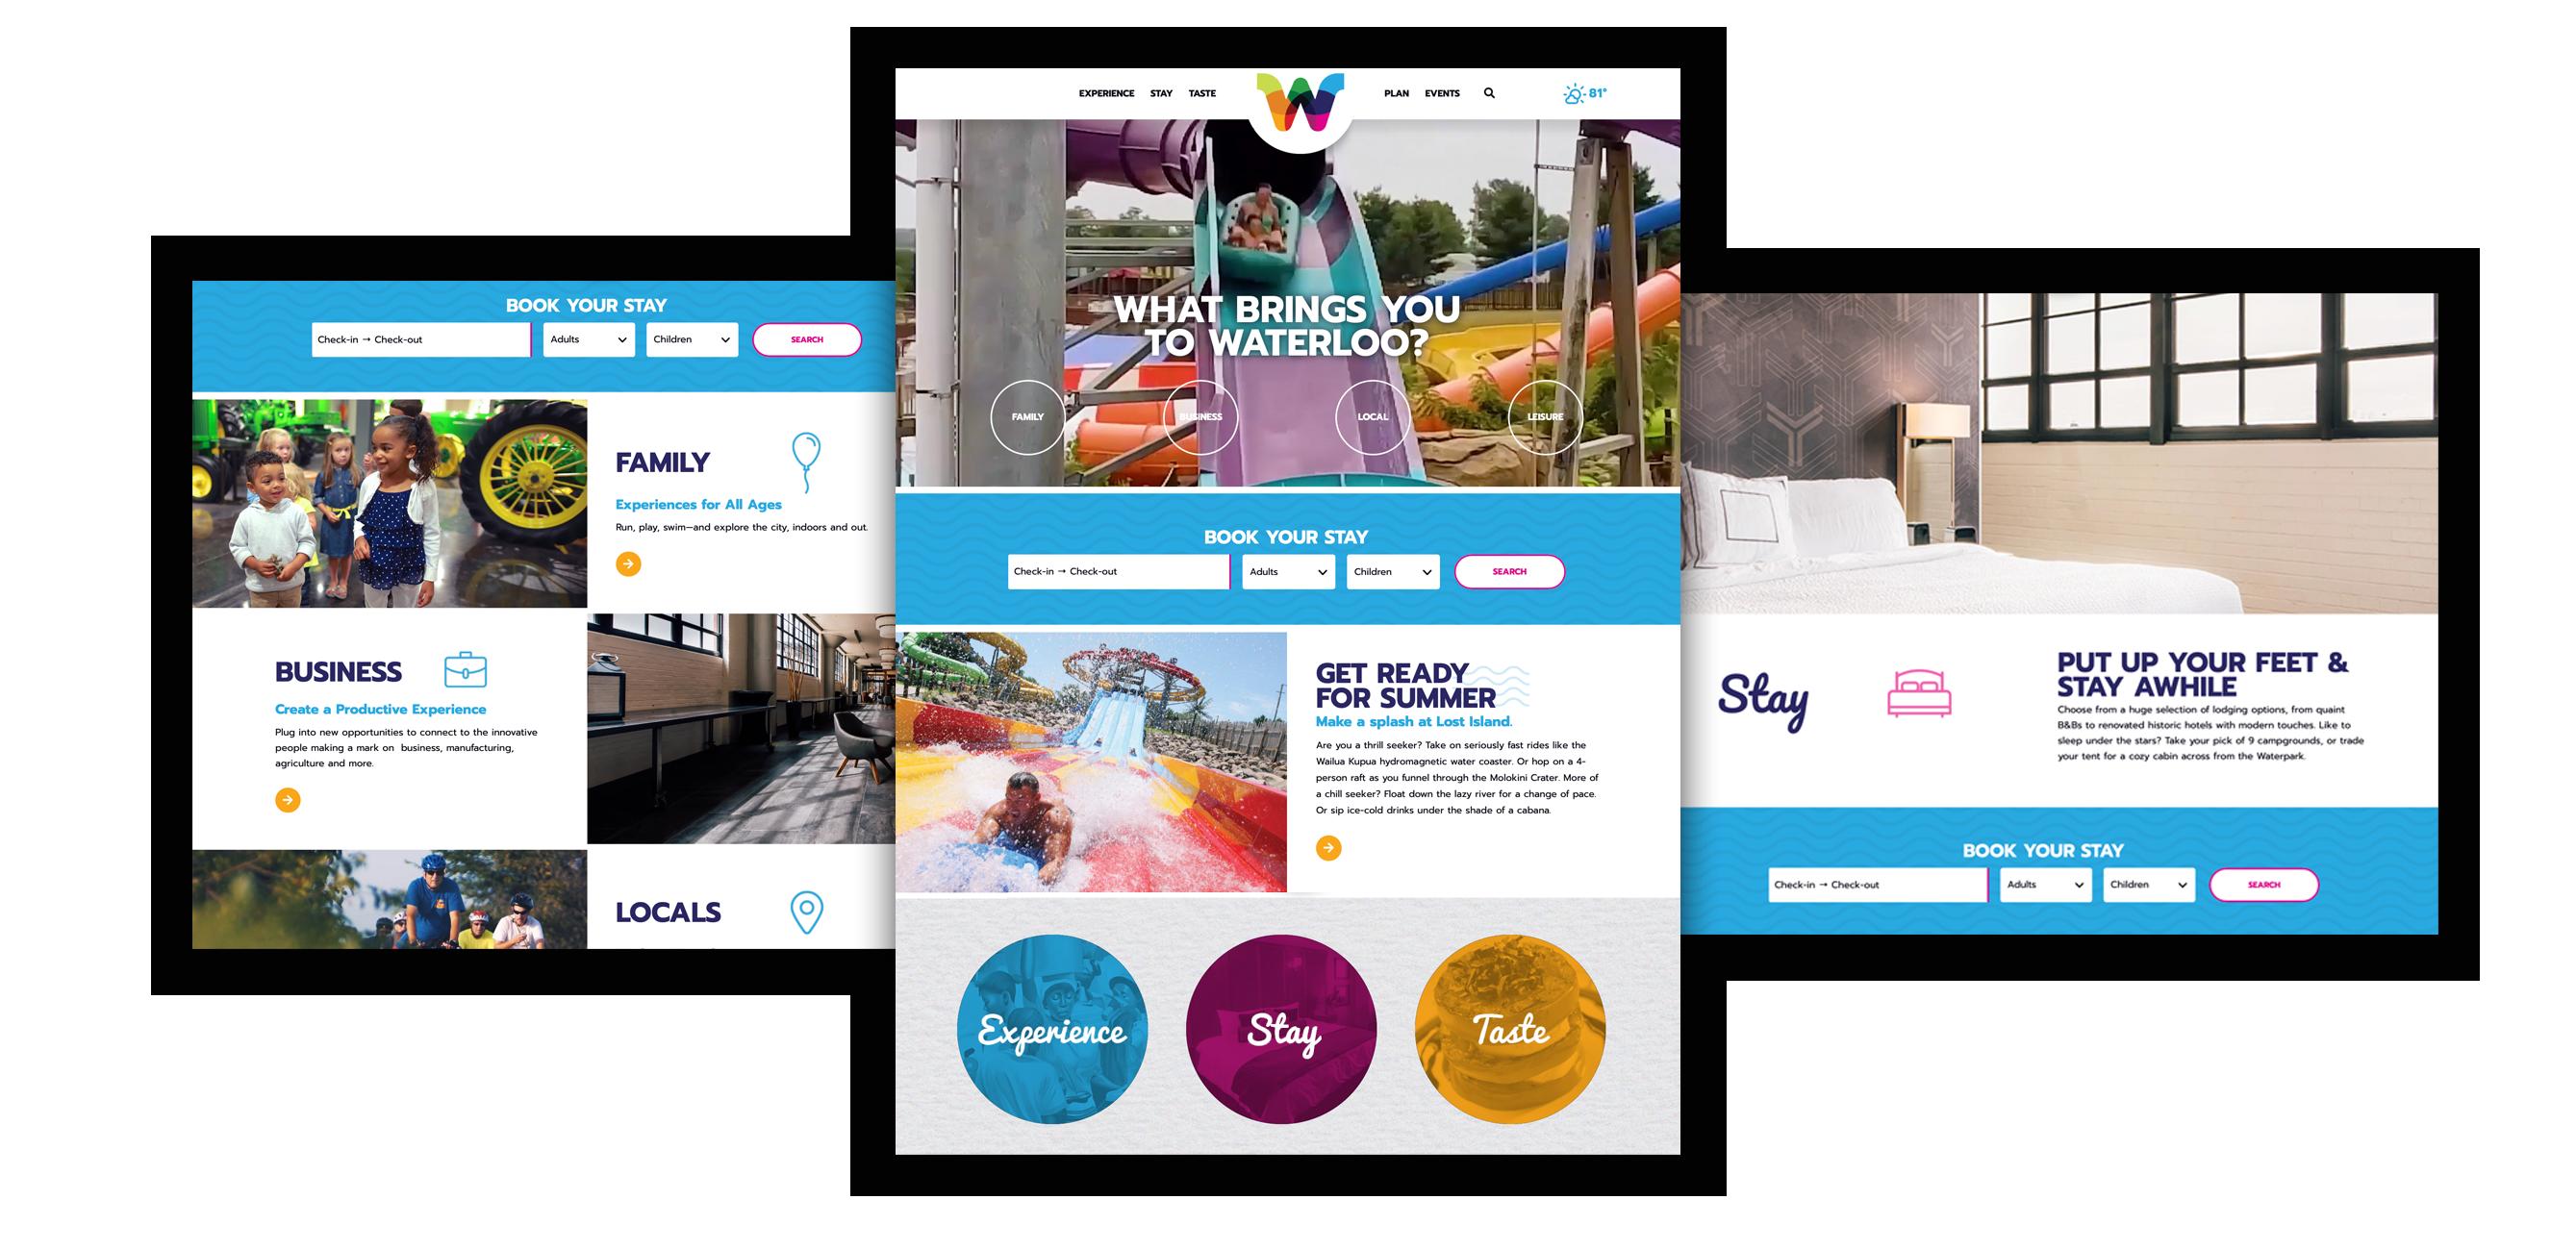 Experience Waterloo website mock up images